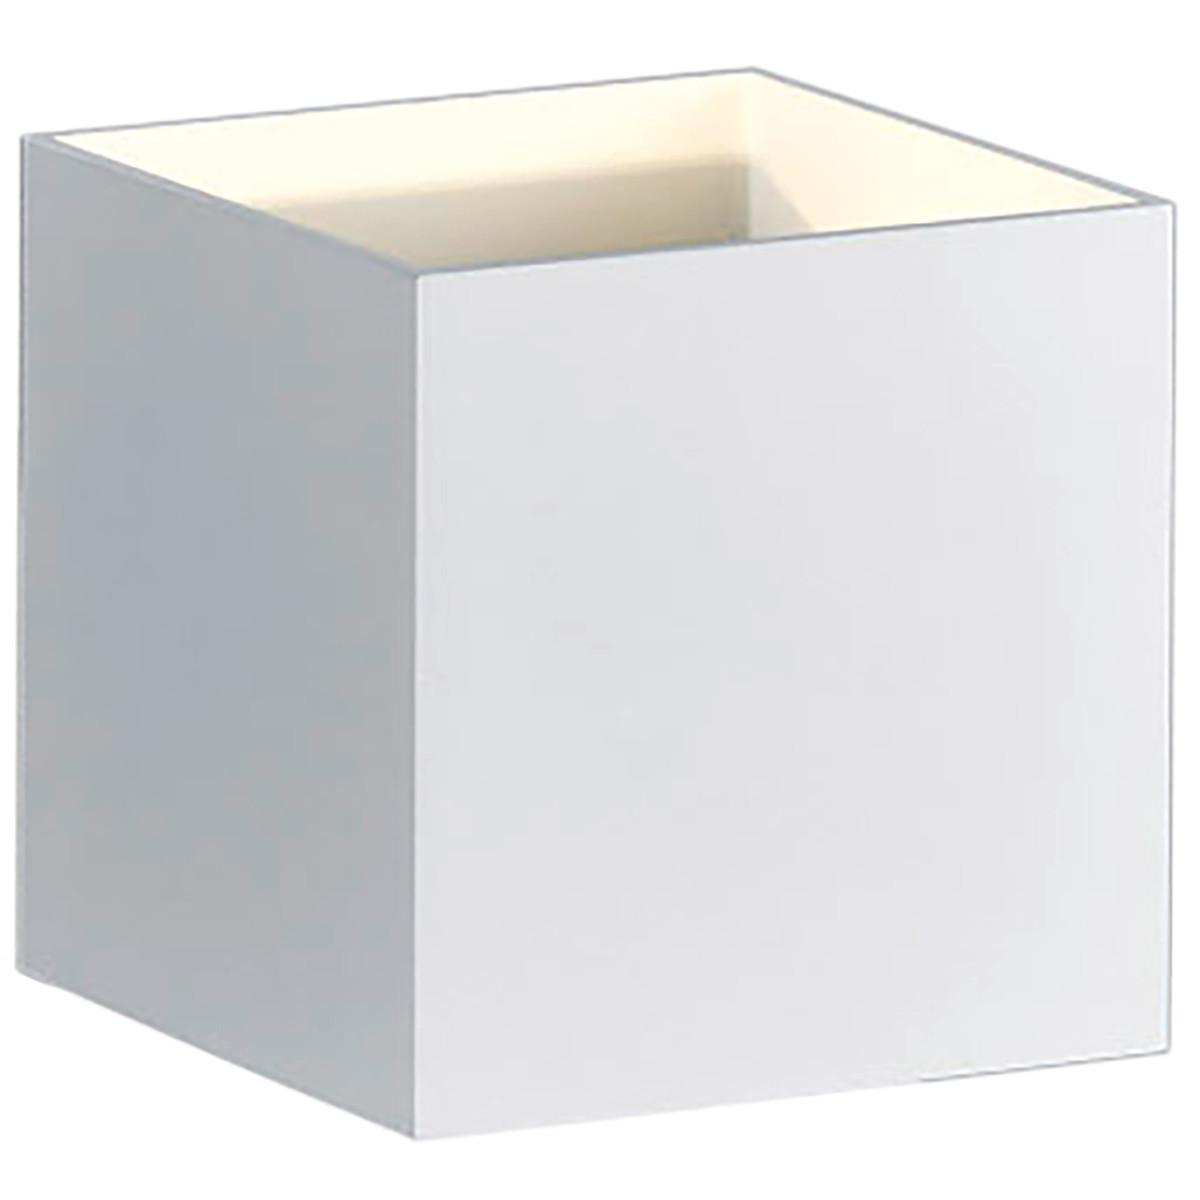 OSRAM - LED Wandlamp - Trion Loacy - 4W - Warm Wit 3000K - Vierkant - Mat Wit - Aluminium